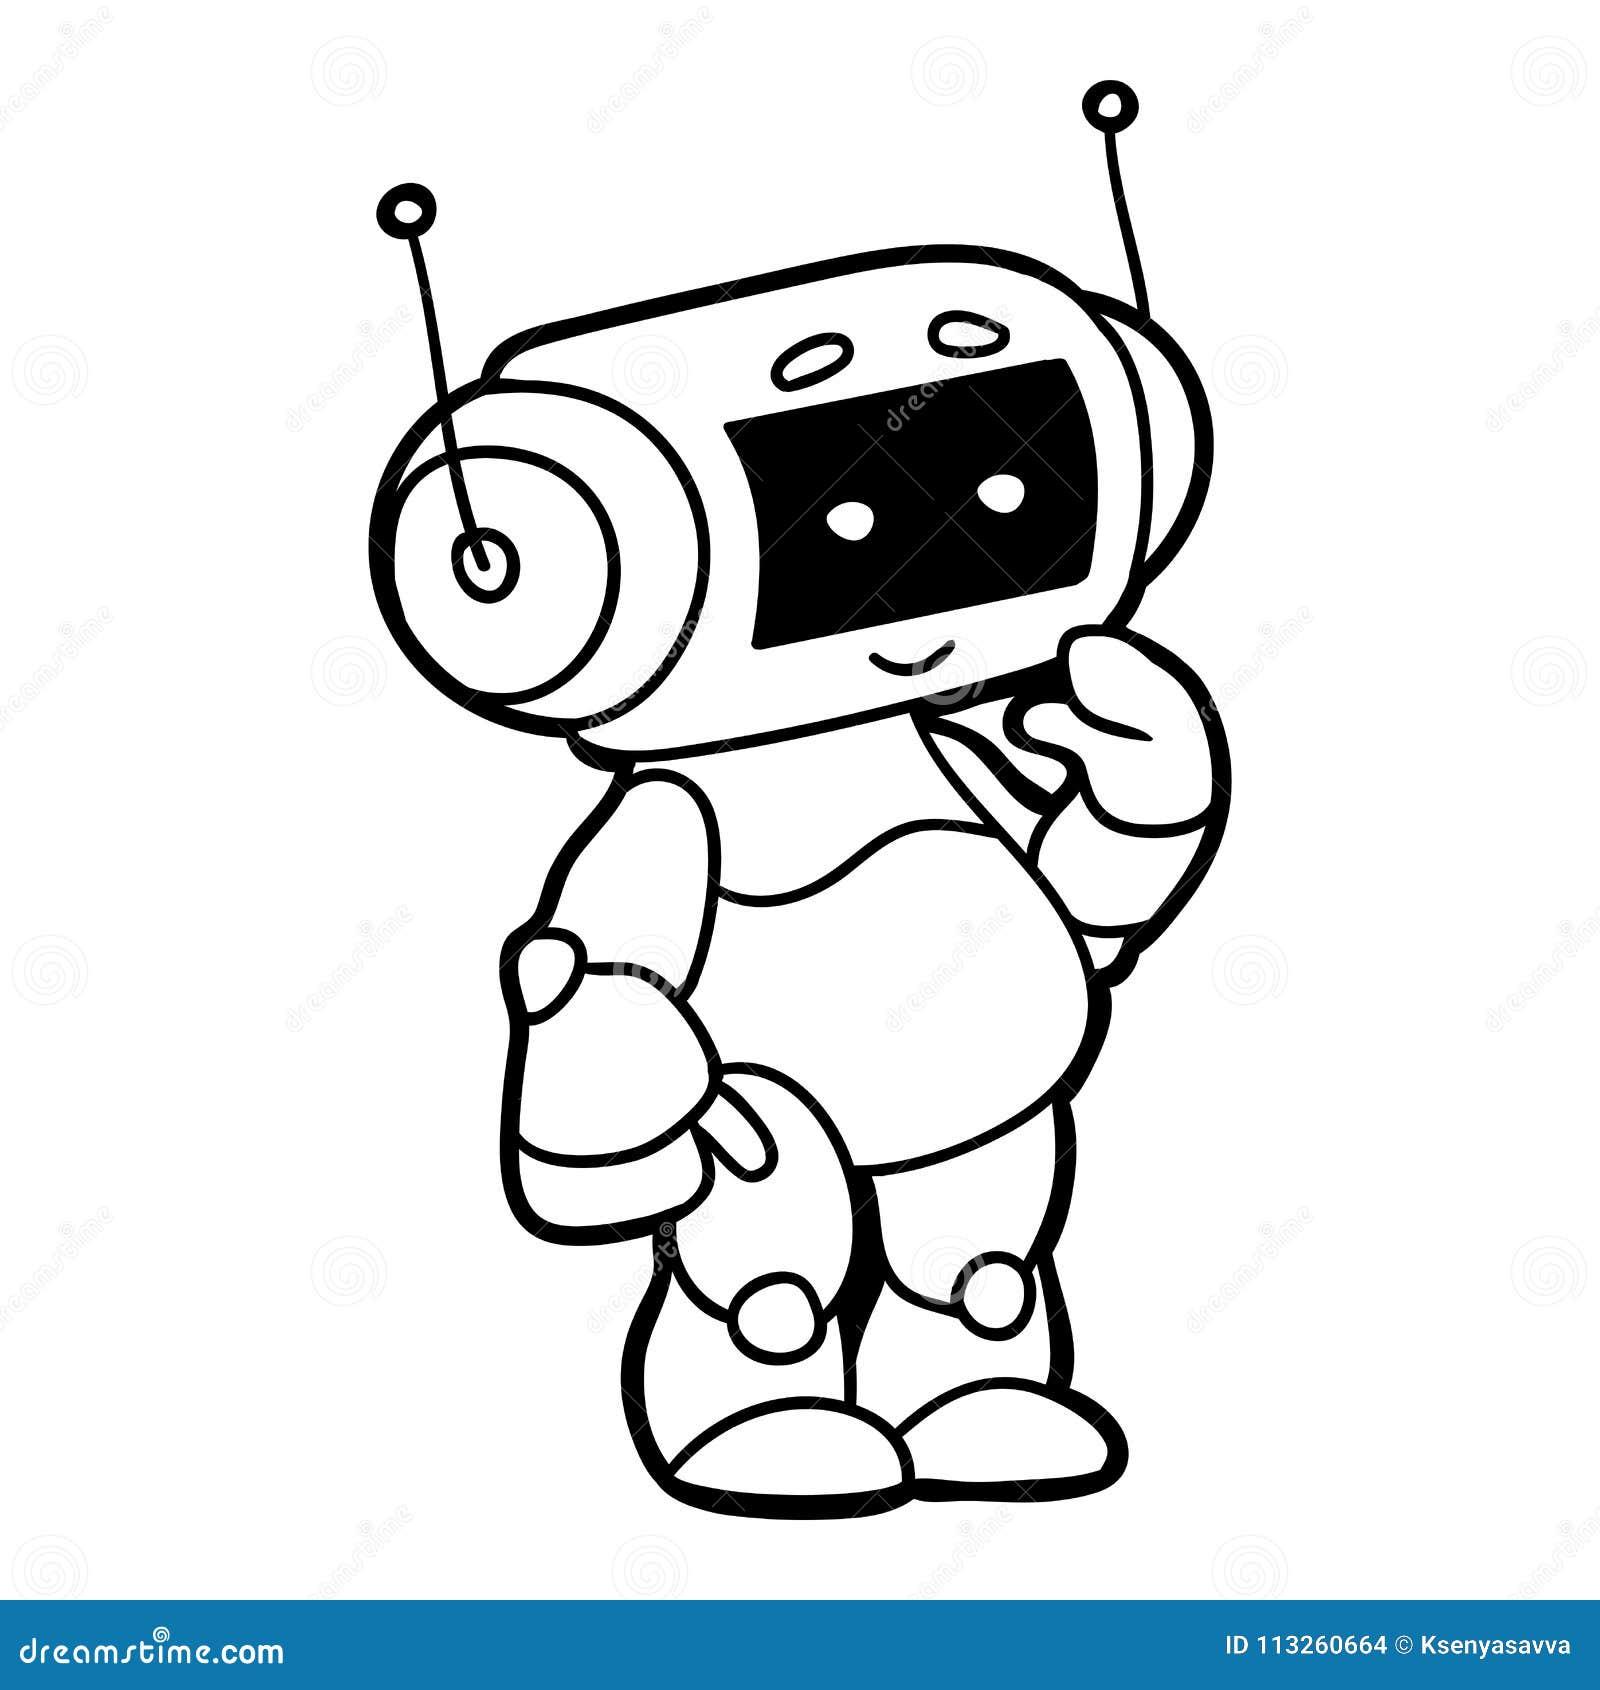 Livro Para Colorir Robo Ilustracao Do Vetor Ilustracao De